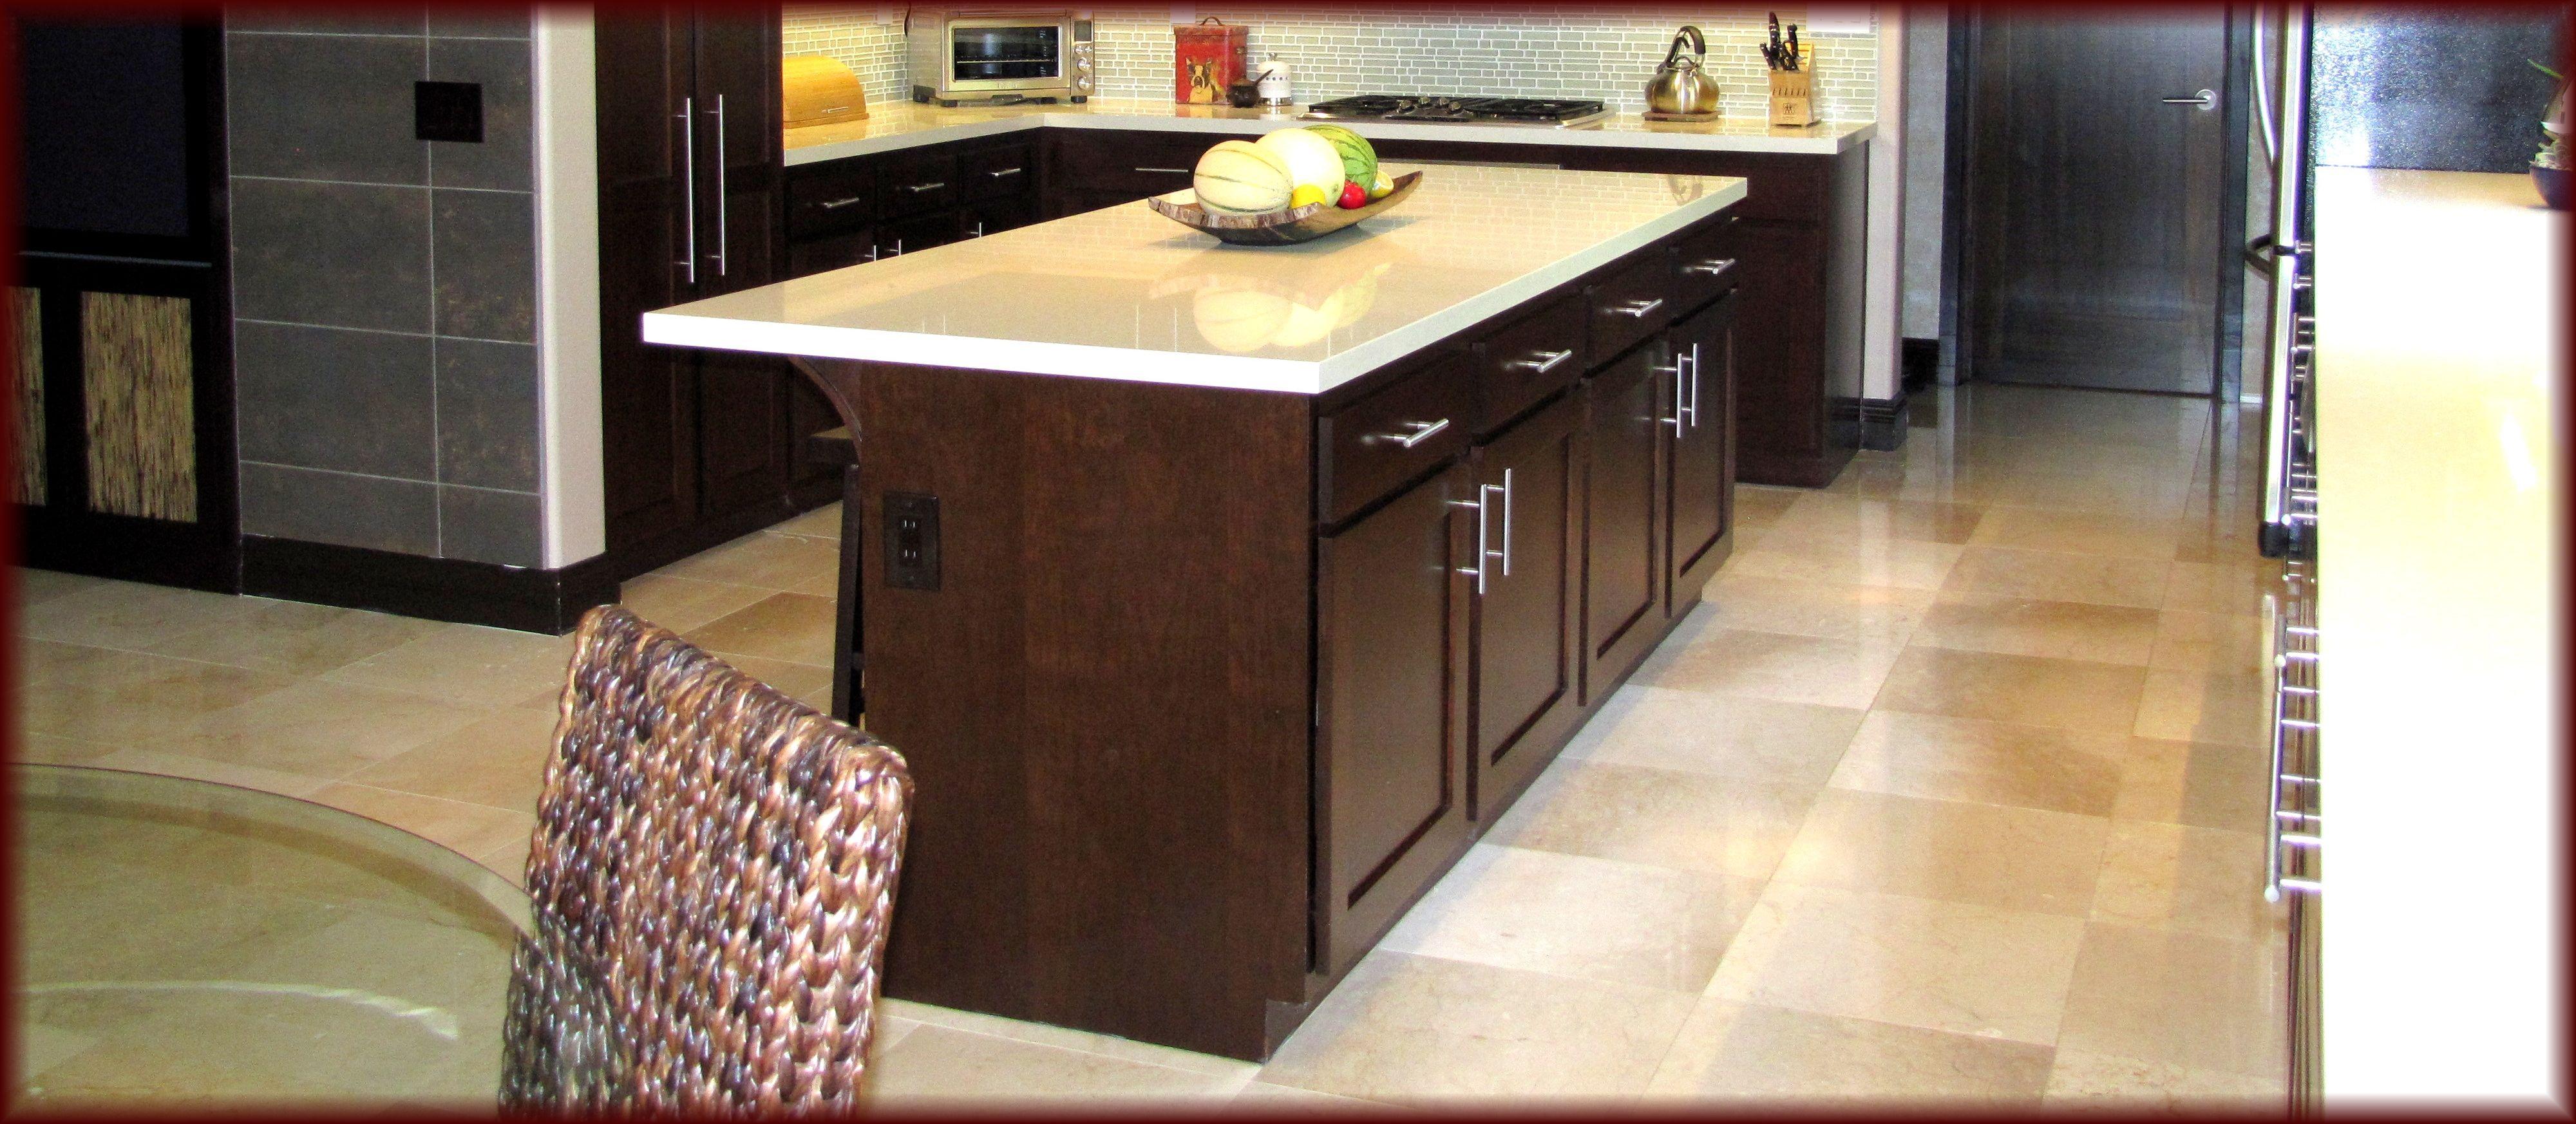 Kitchen cabinet refacing in Irvine, Orange County CA ...